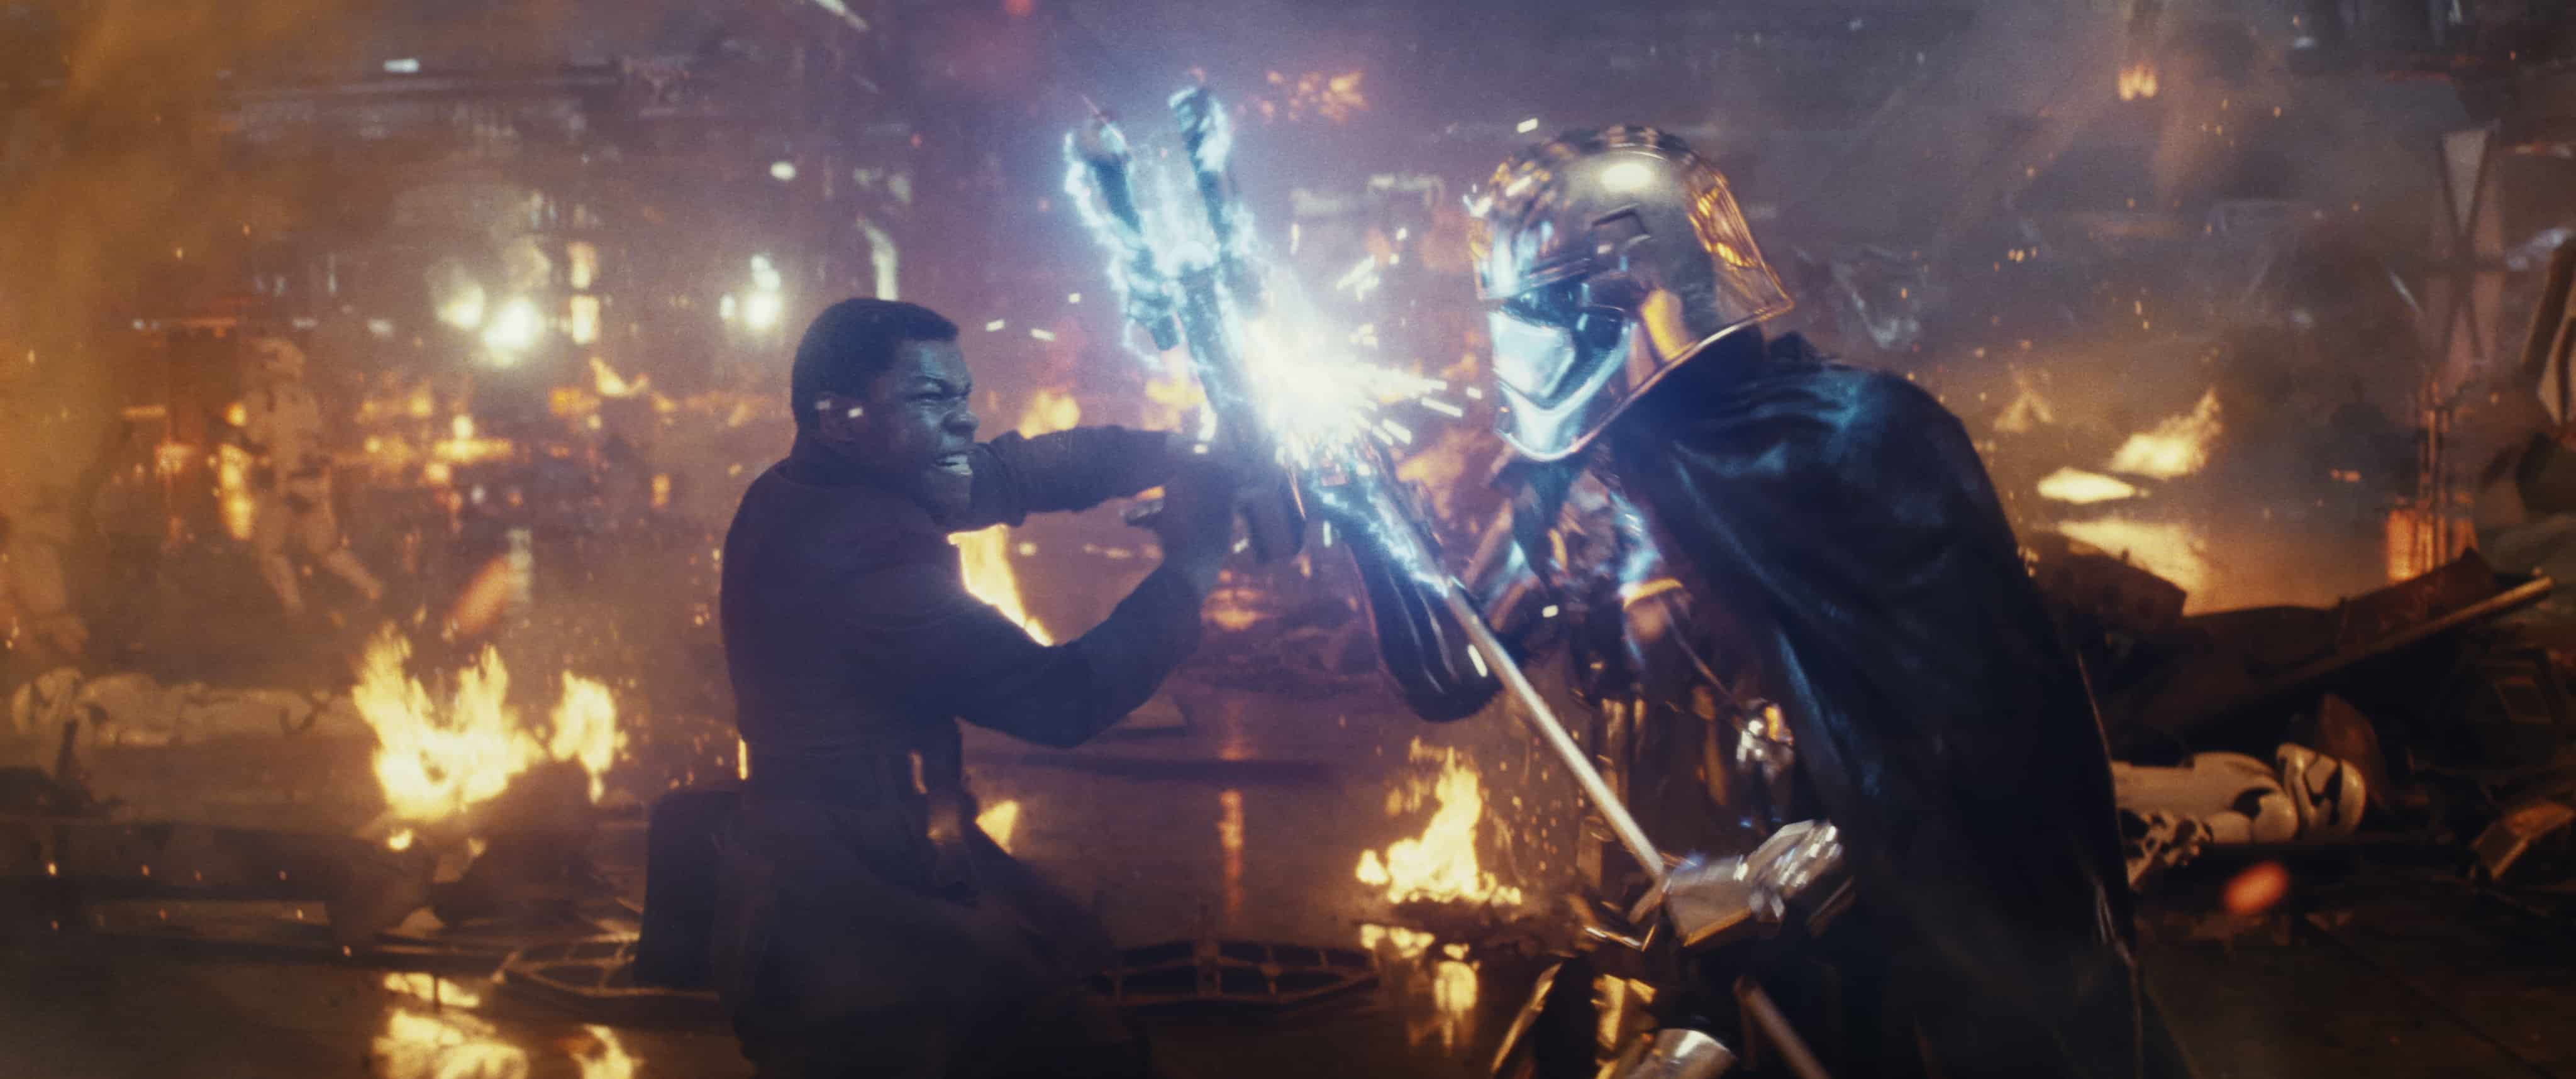 New Star Wars The Last Jedi Trailer